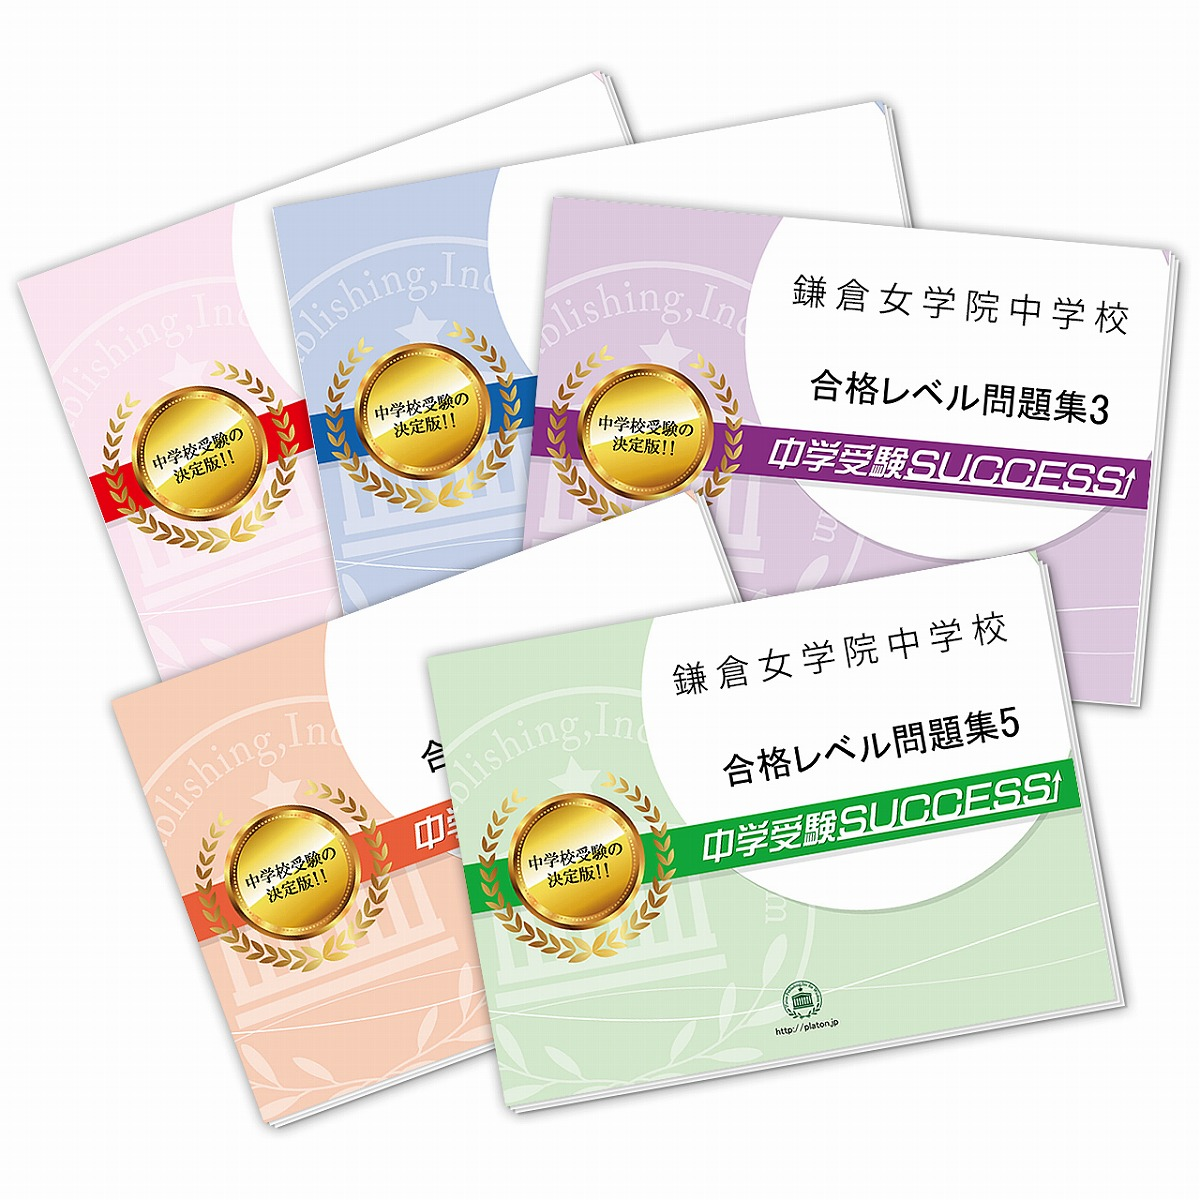 送料 代引手数料無料 超安い 鎌倉女学院中学校 大放出セール 直前対策合格セット 5冊